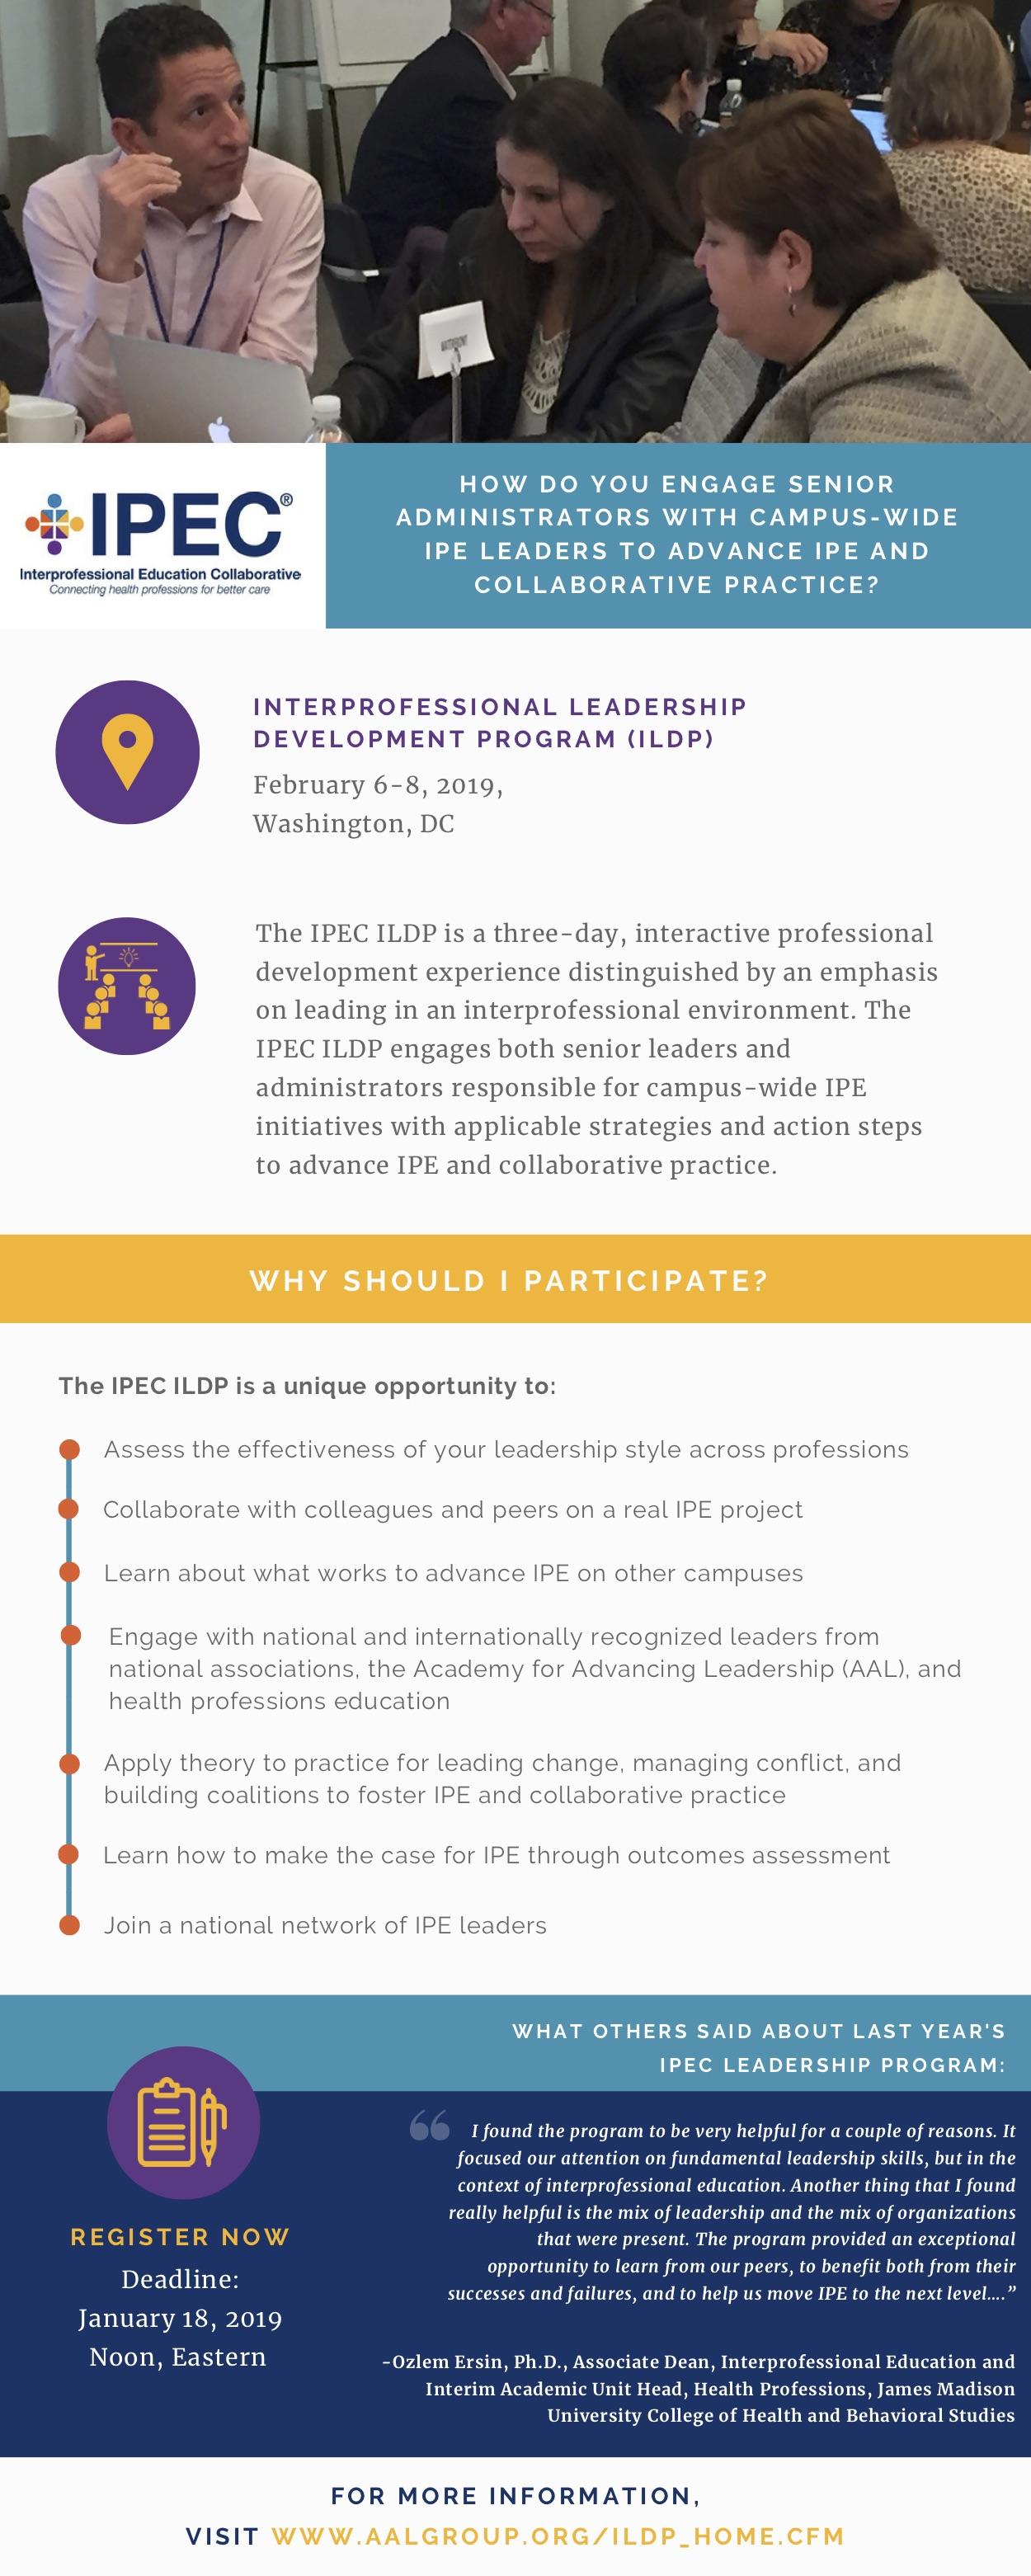 IPEC ILDP Infographic_College of Health Professions_Health Sciences.jpg